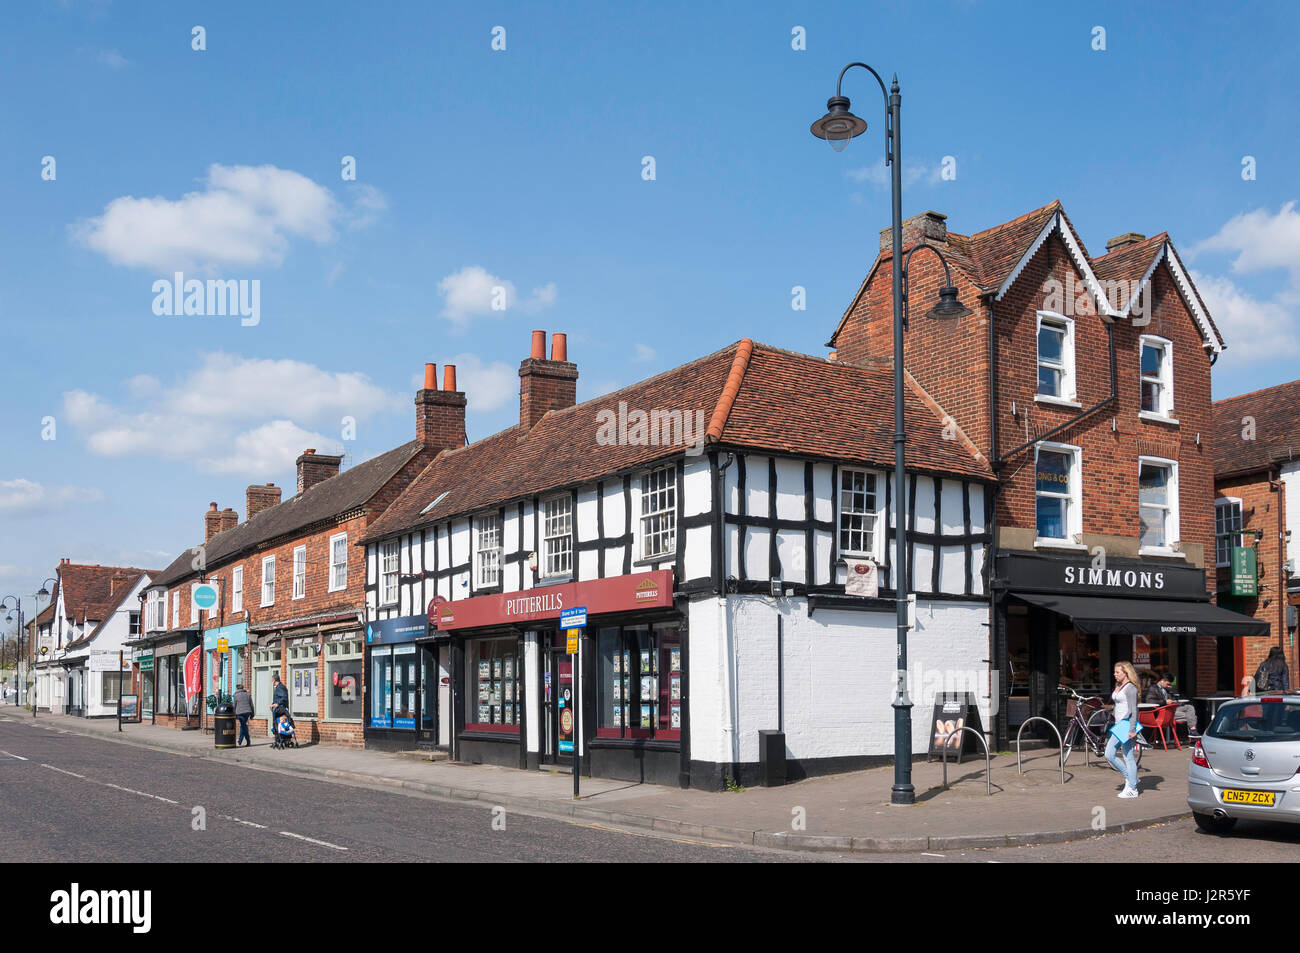 High Street, Old Town, Stevenage, Hertfordshire, England, United Kingdom - Stock Image